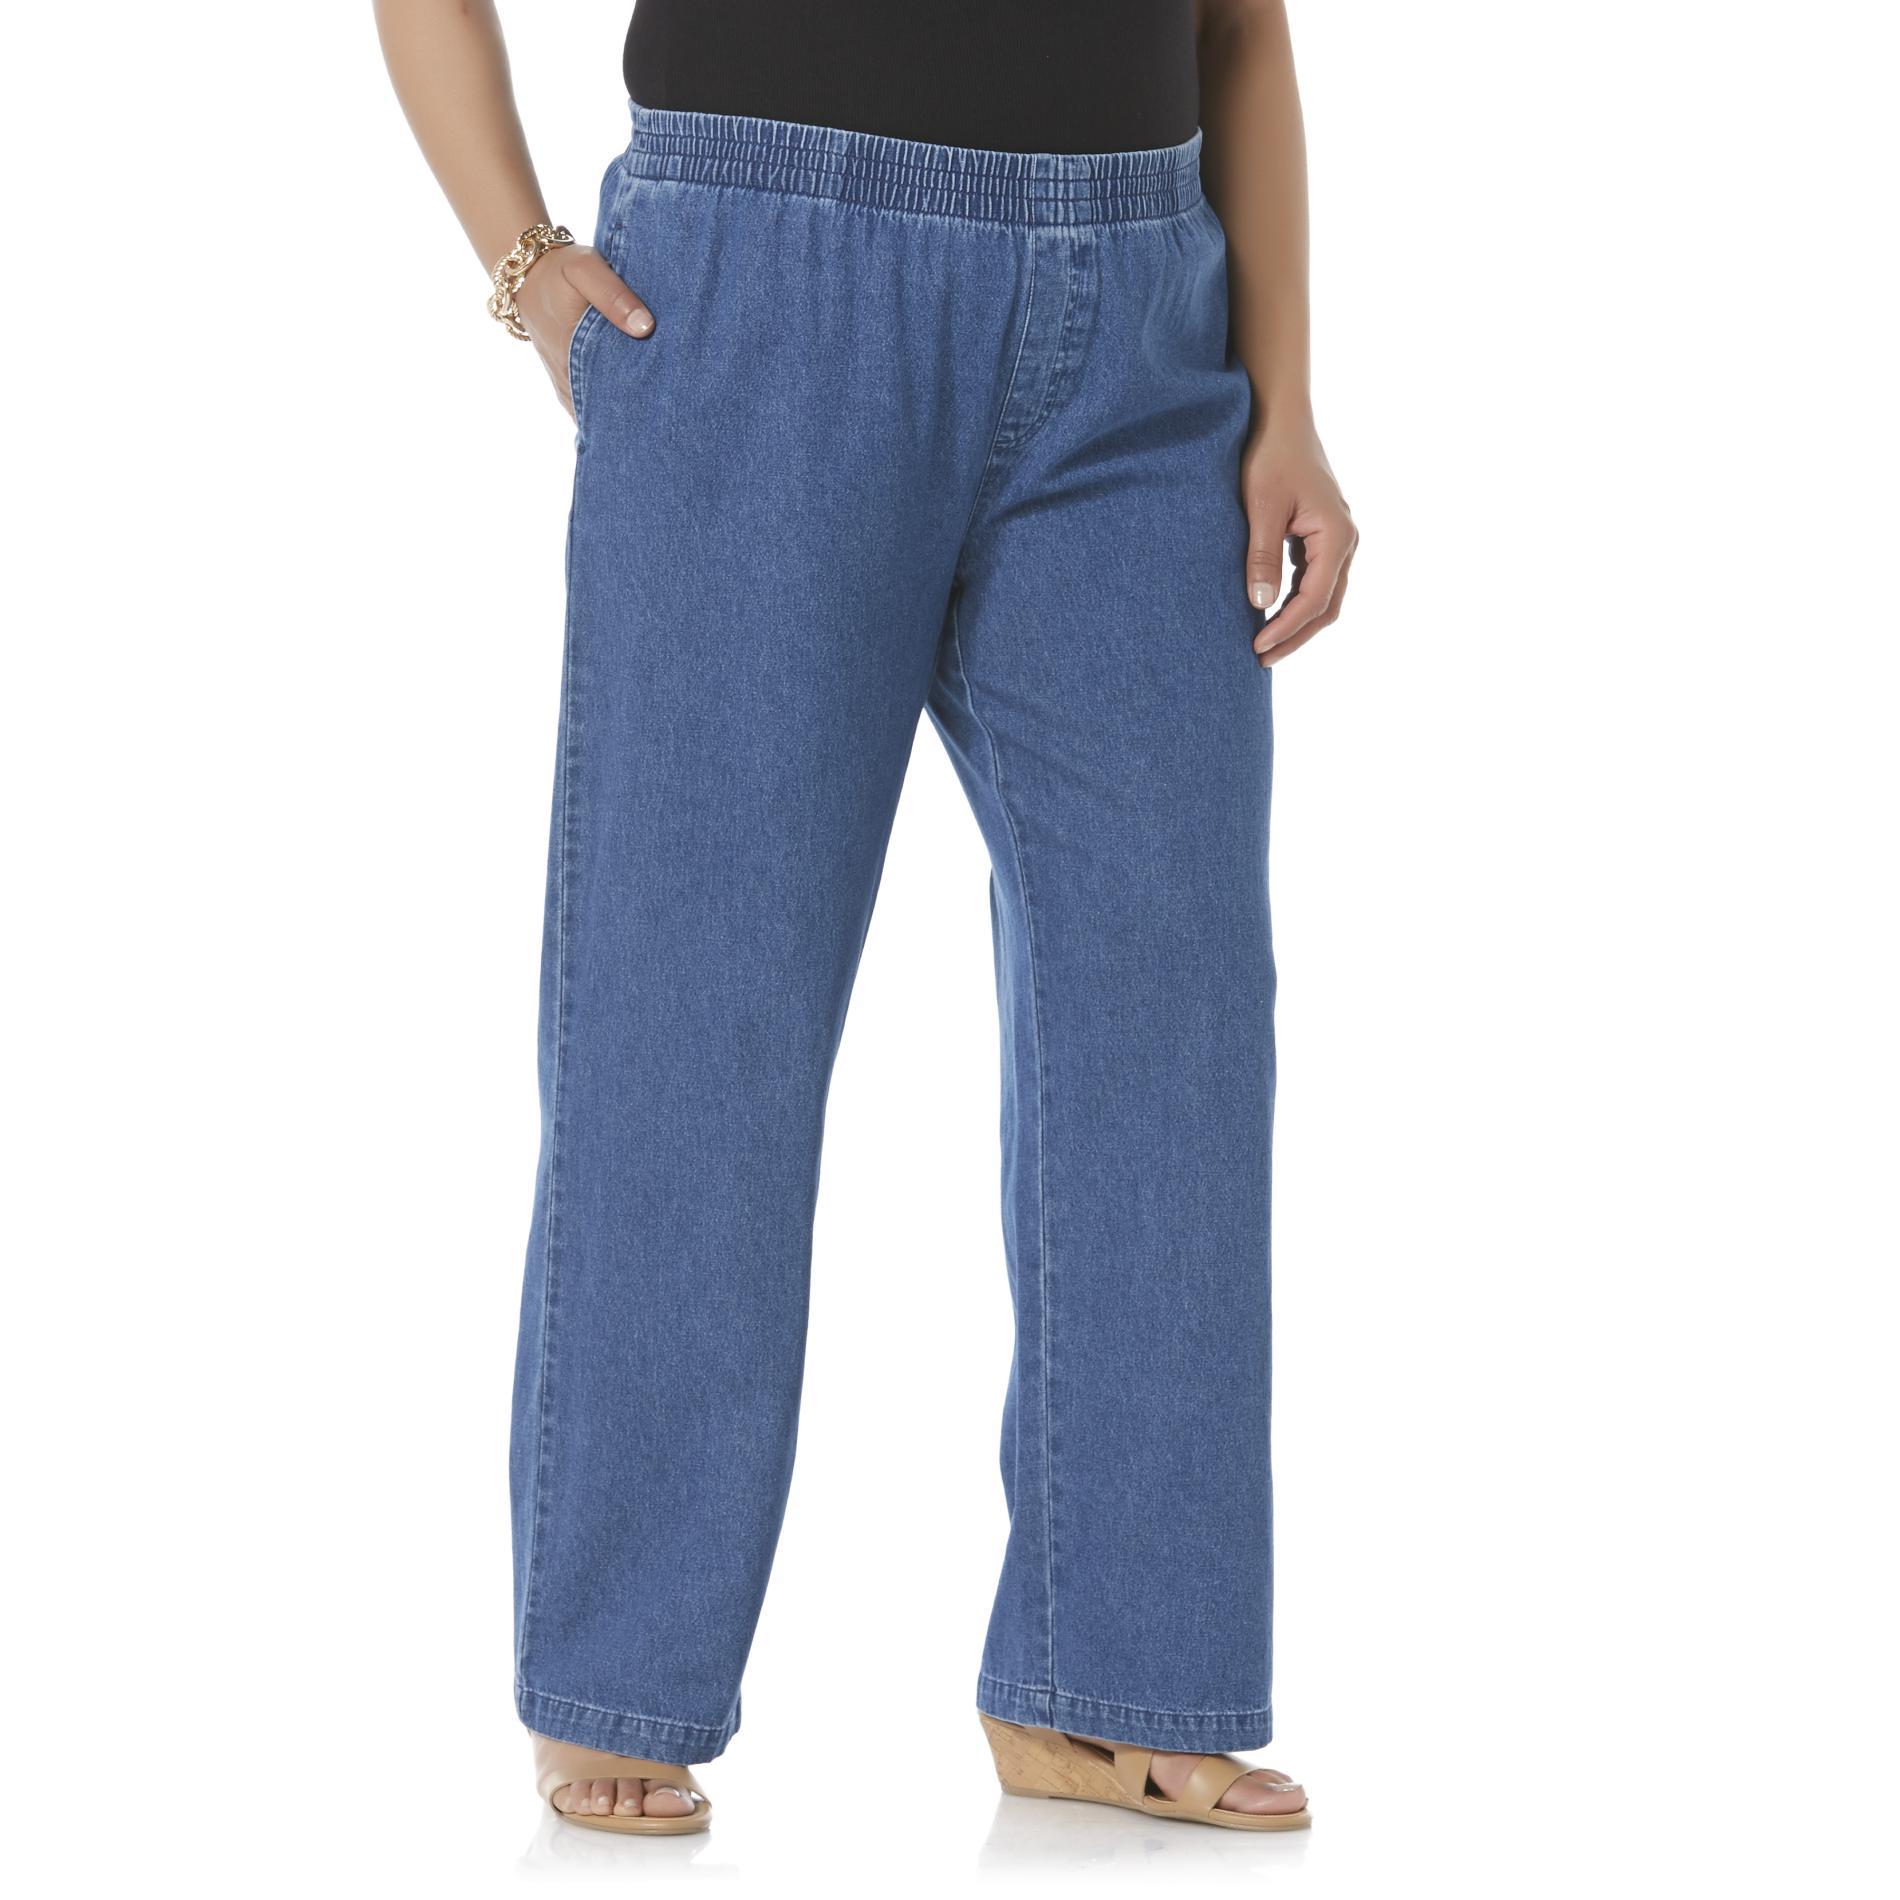 Women's Plus Elastic Waist Jeans